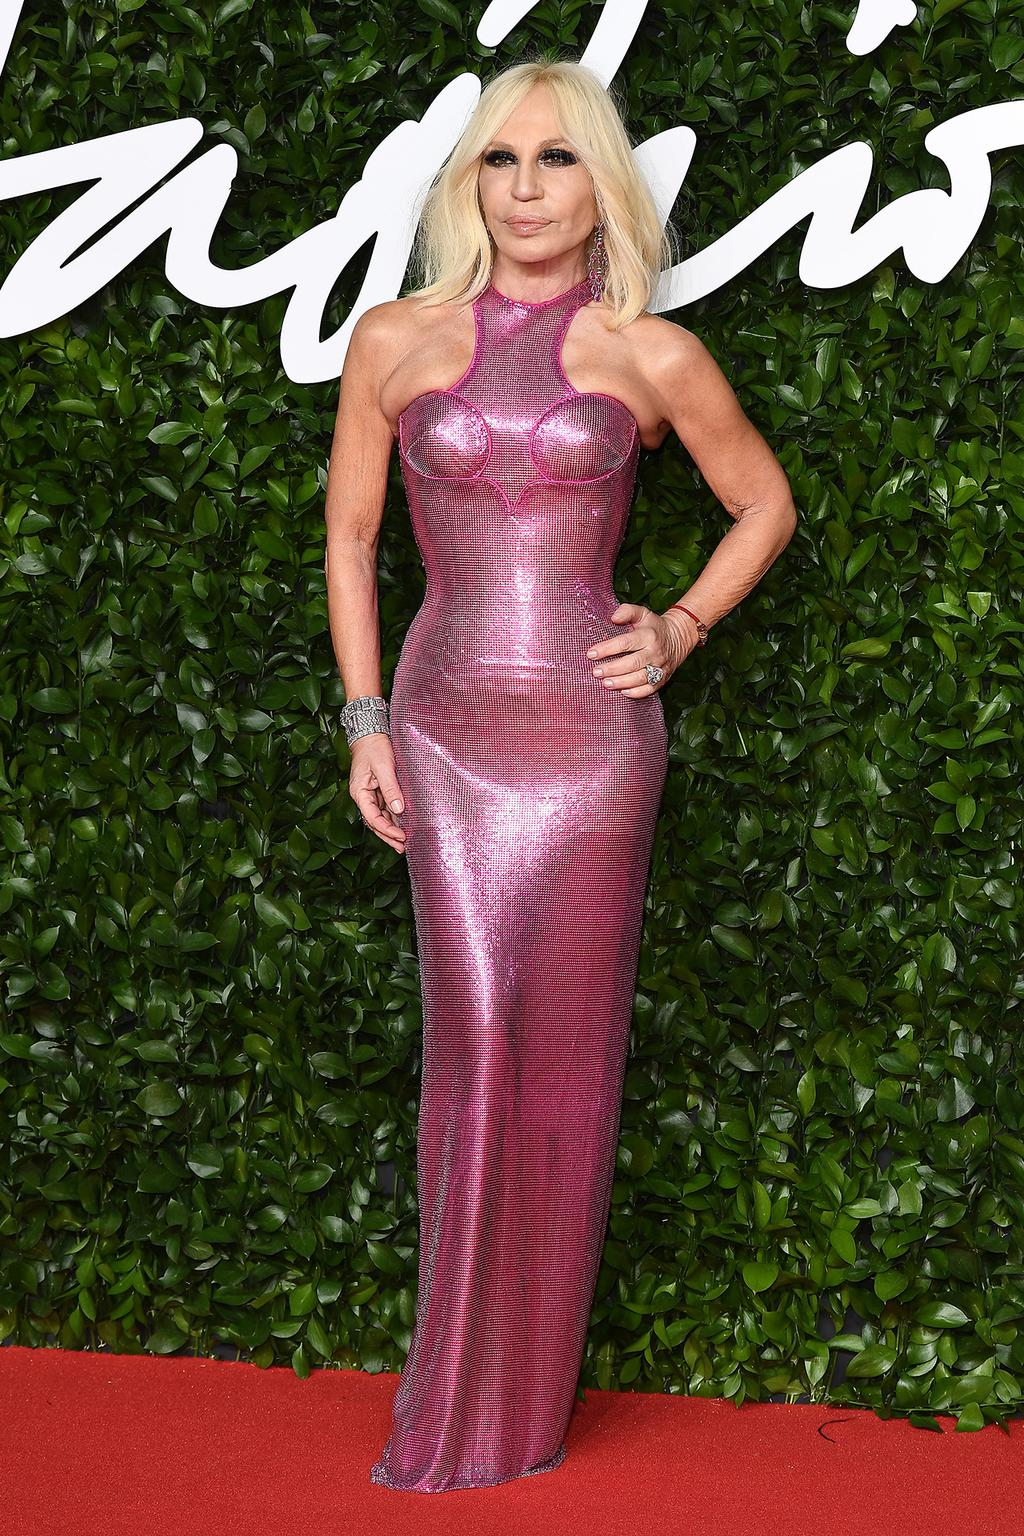 ddonatella-versace-attends-2019-british-fashion-awards